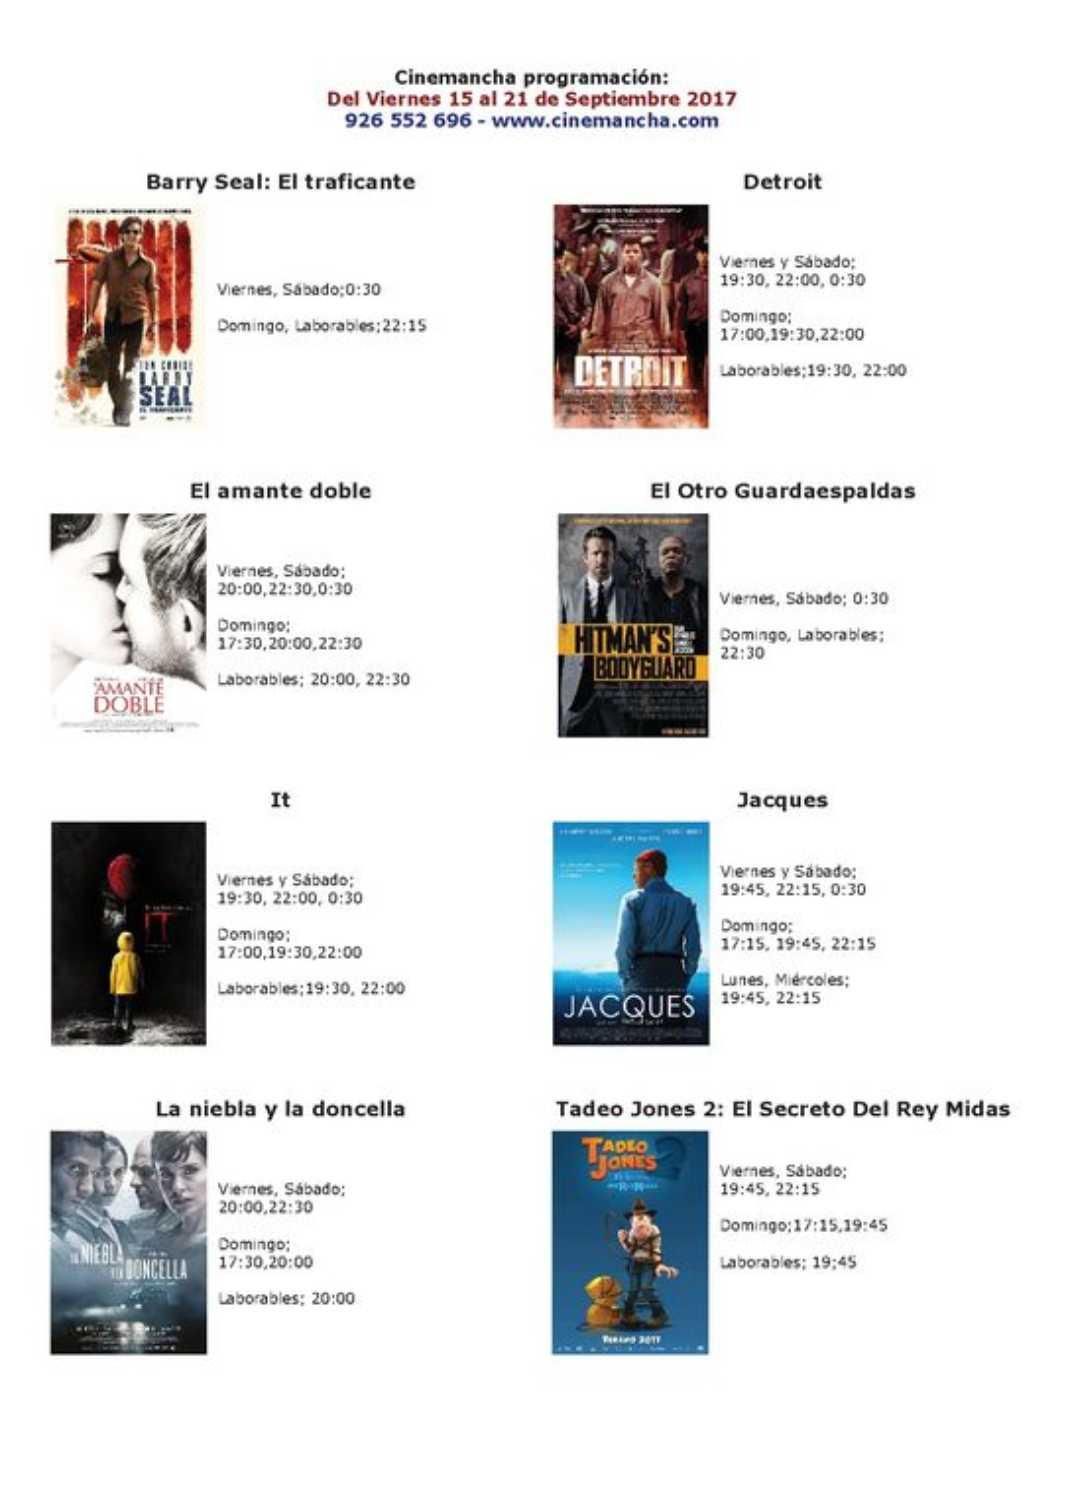 cartelera de cinemancha del 15 al 21 de septiembre 1068x1511 - Películas en Cinemancha del 15 al 21 de septiembre